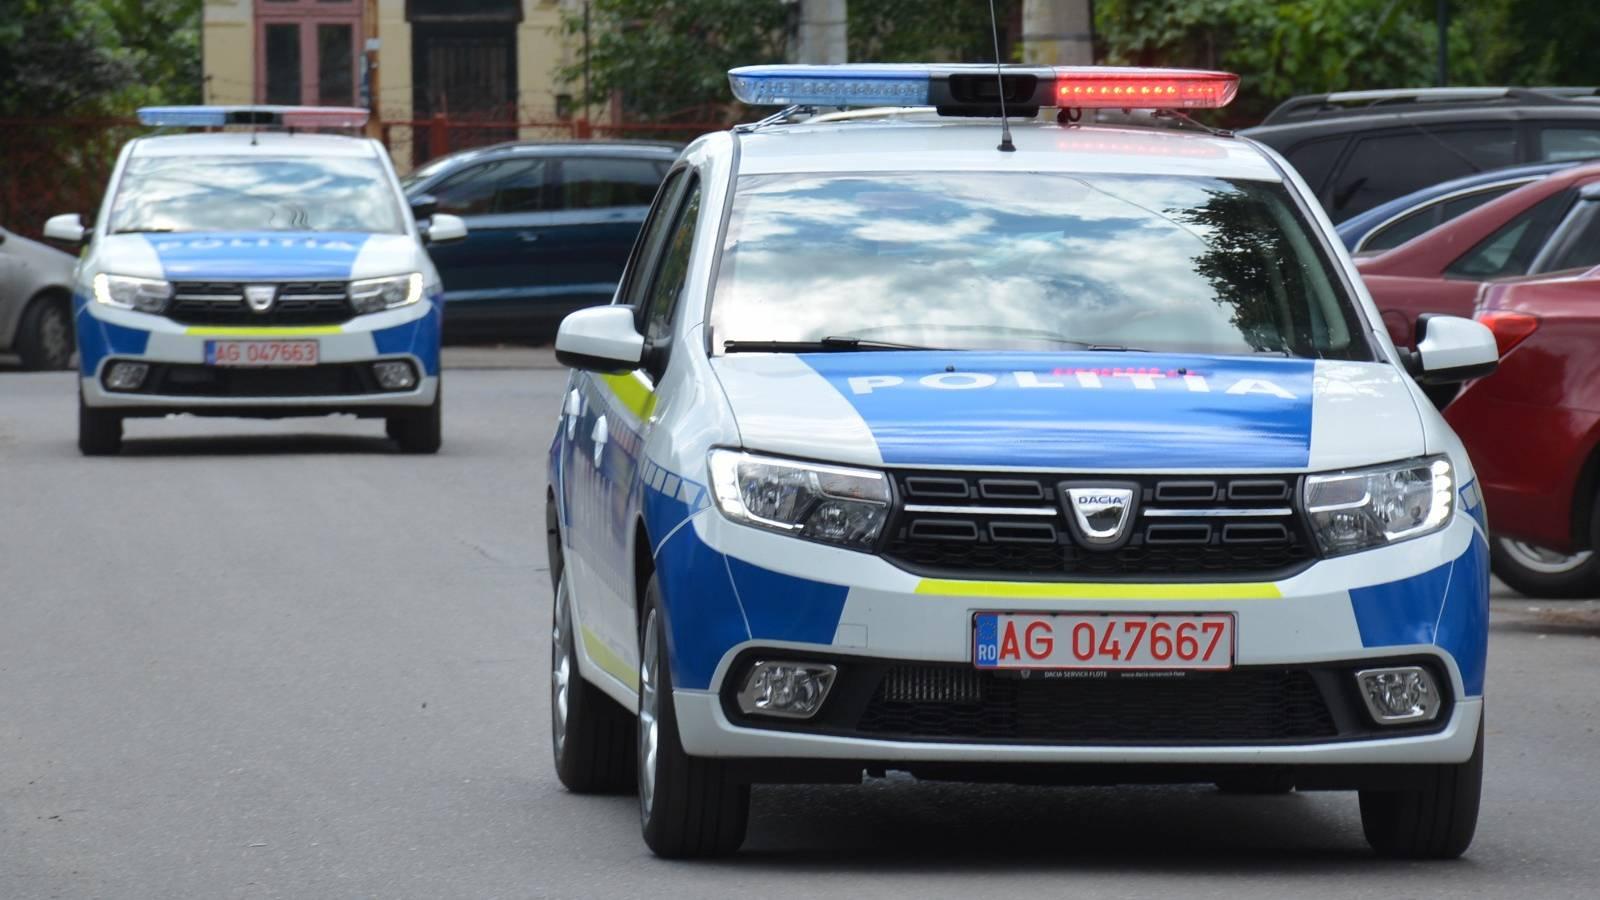 Politia Romana avertisment petarde